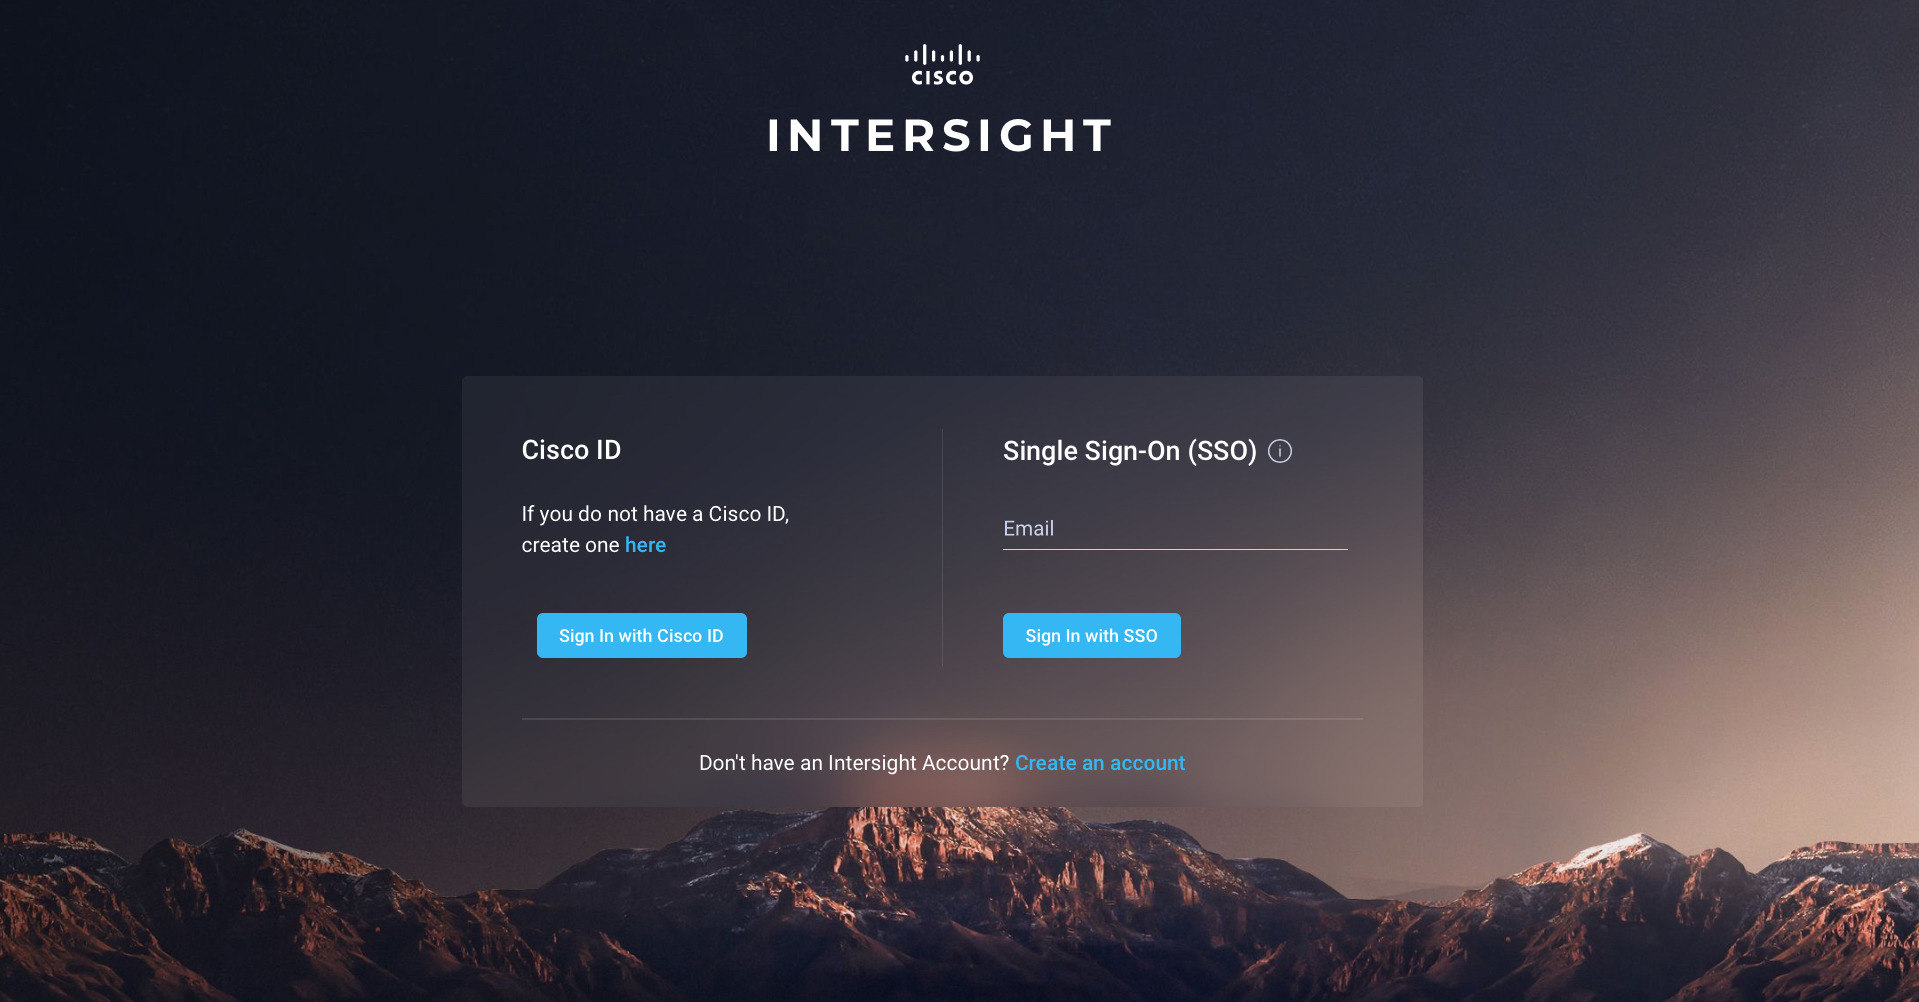 Cisco Intersight login screen